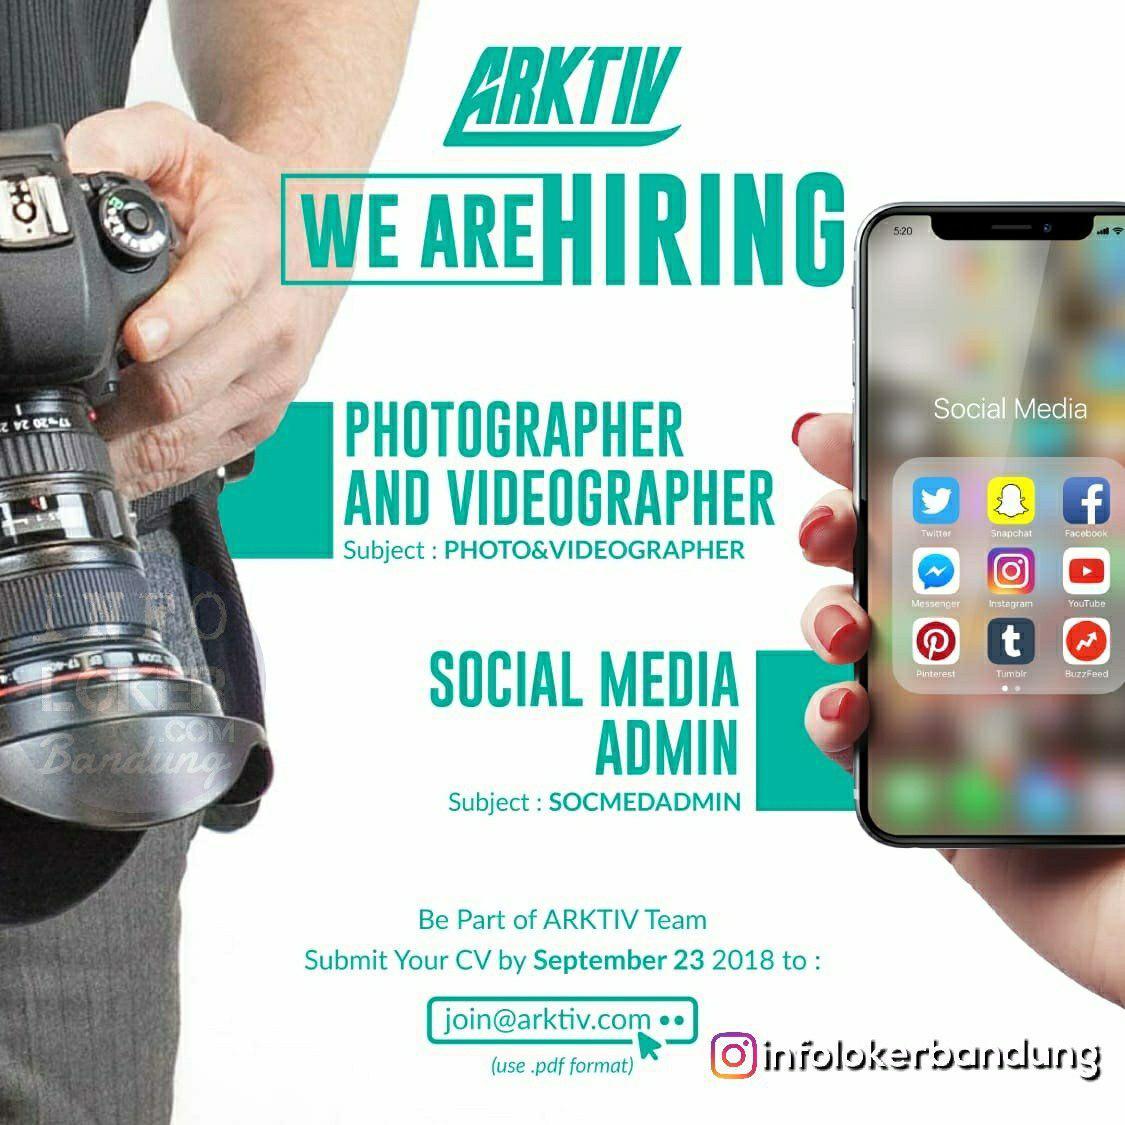 Lowongan Kerja Photographer & Videographer Arktiv Bandung September 2018